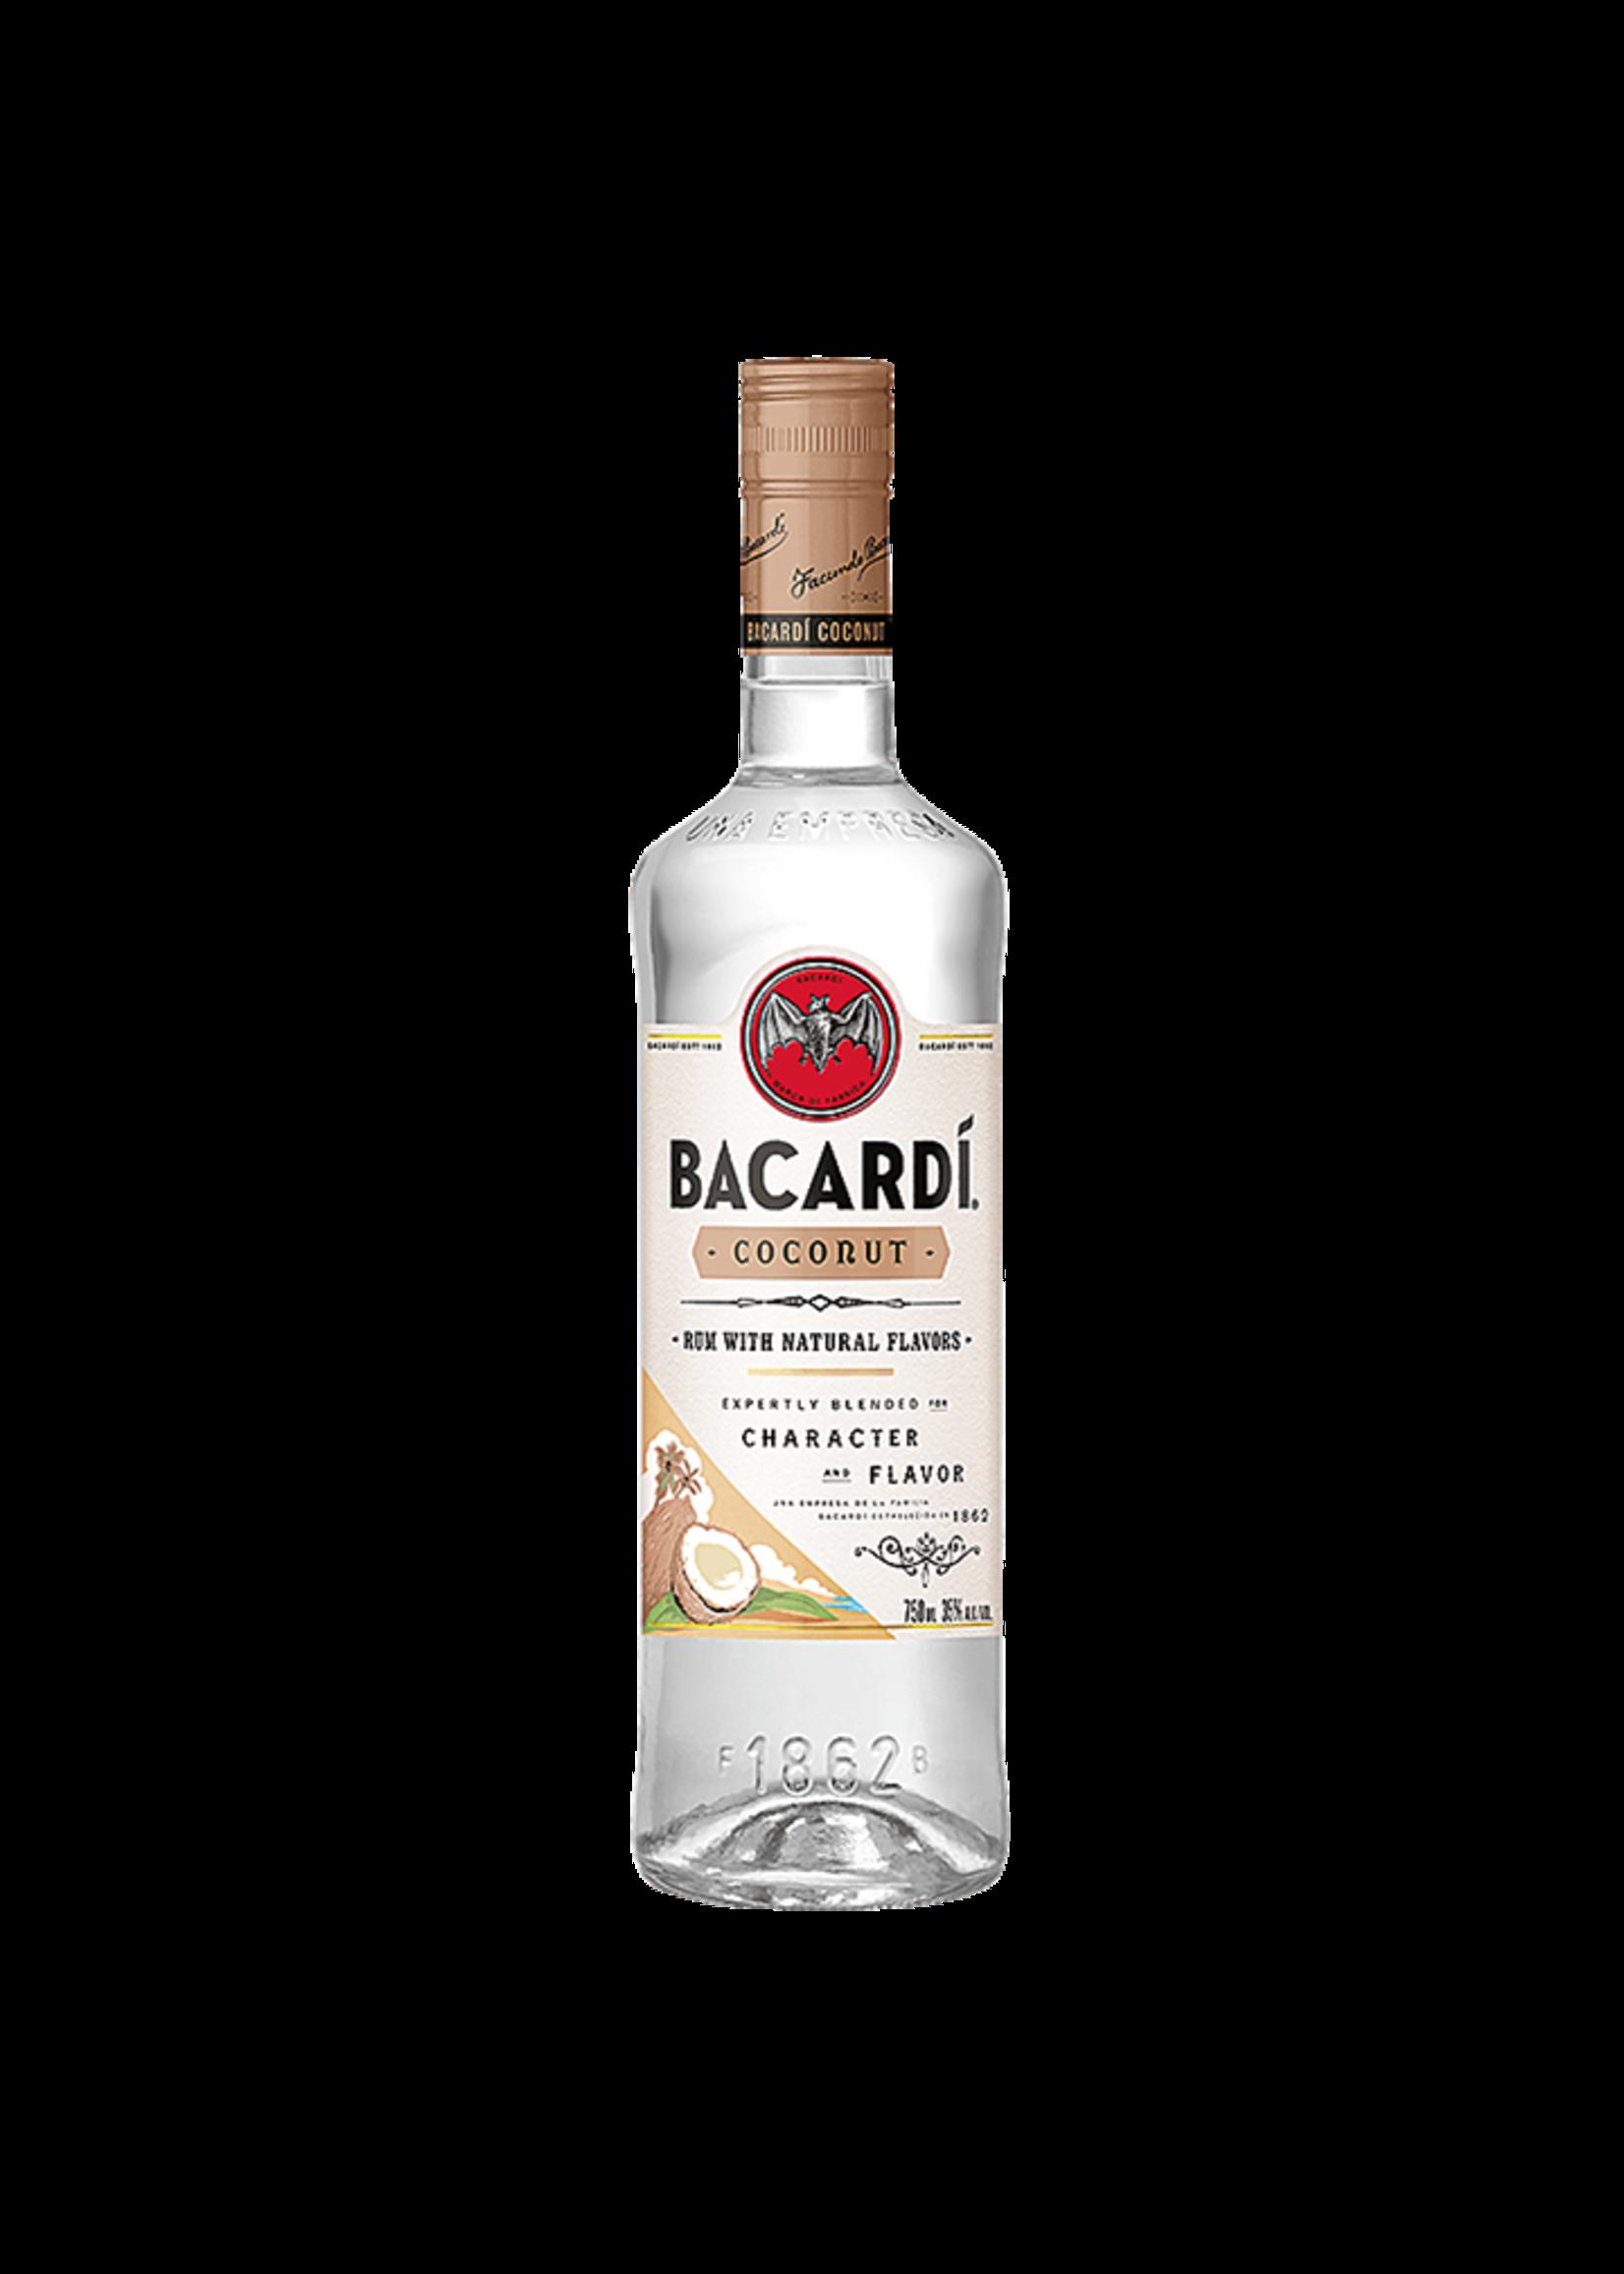 BACARDI Bacardi / Coconut